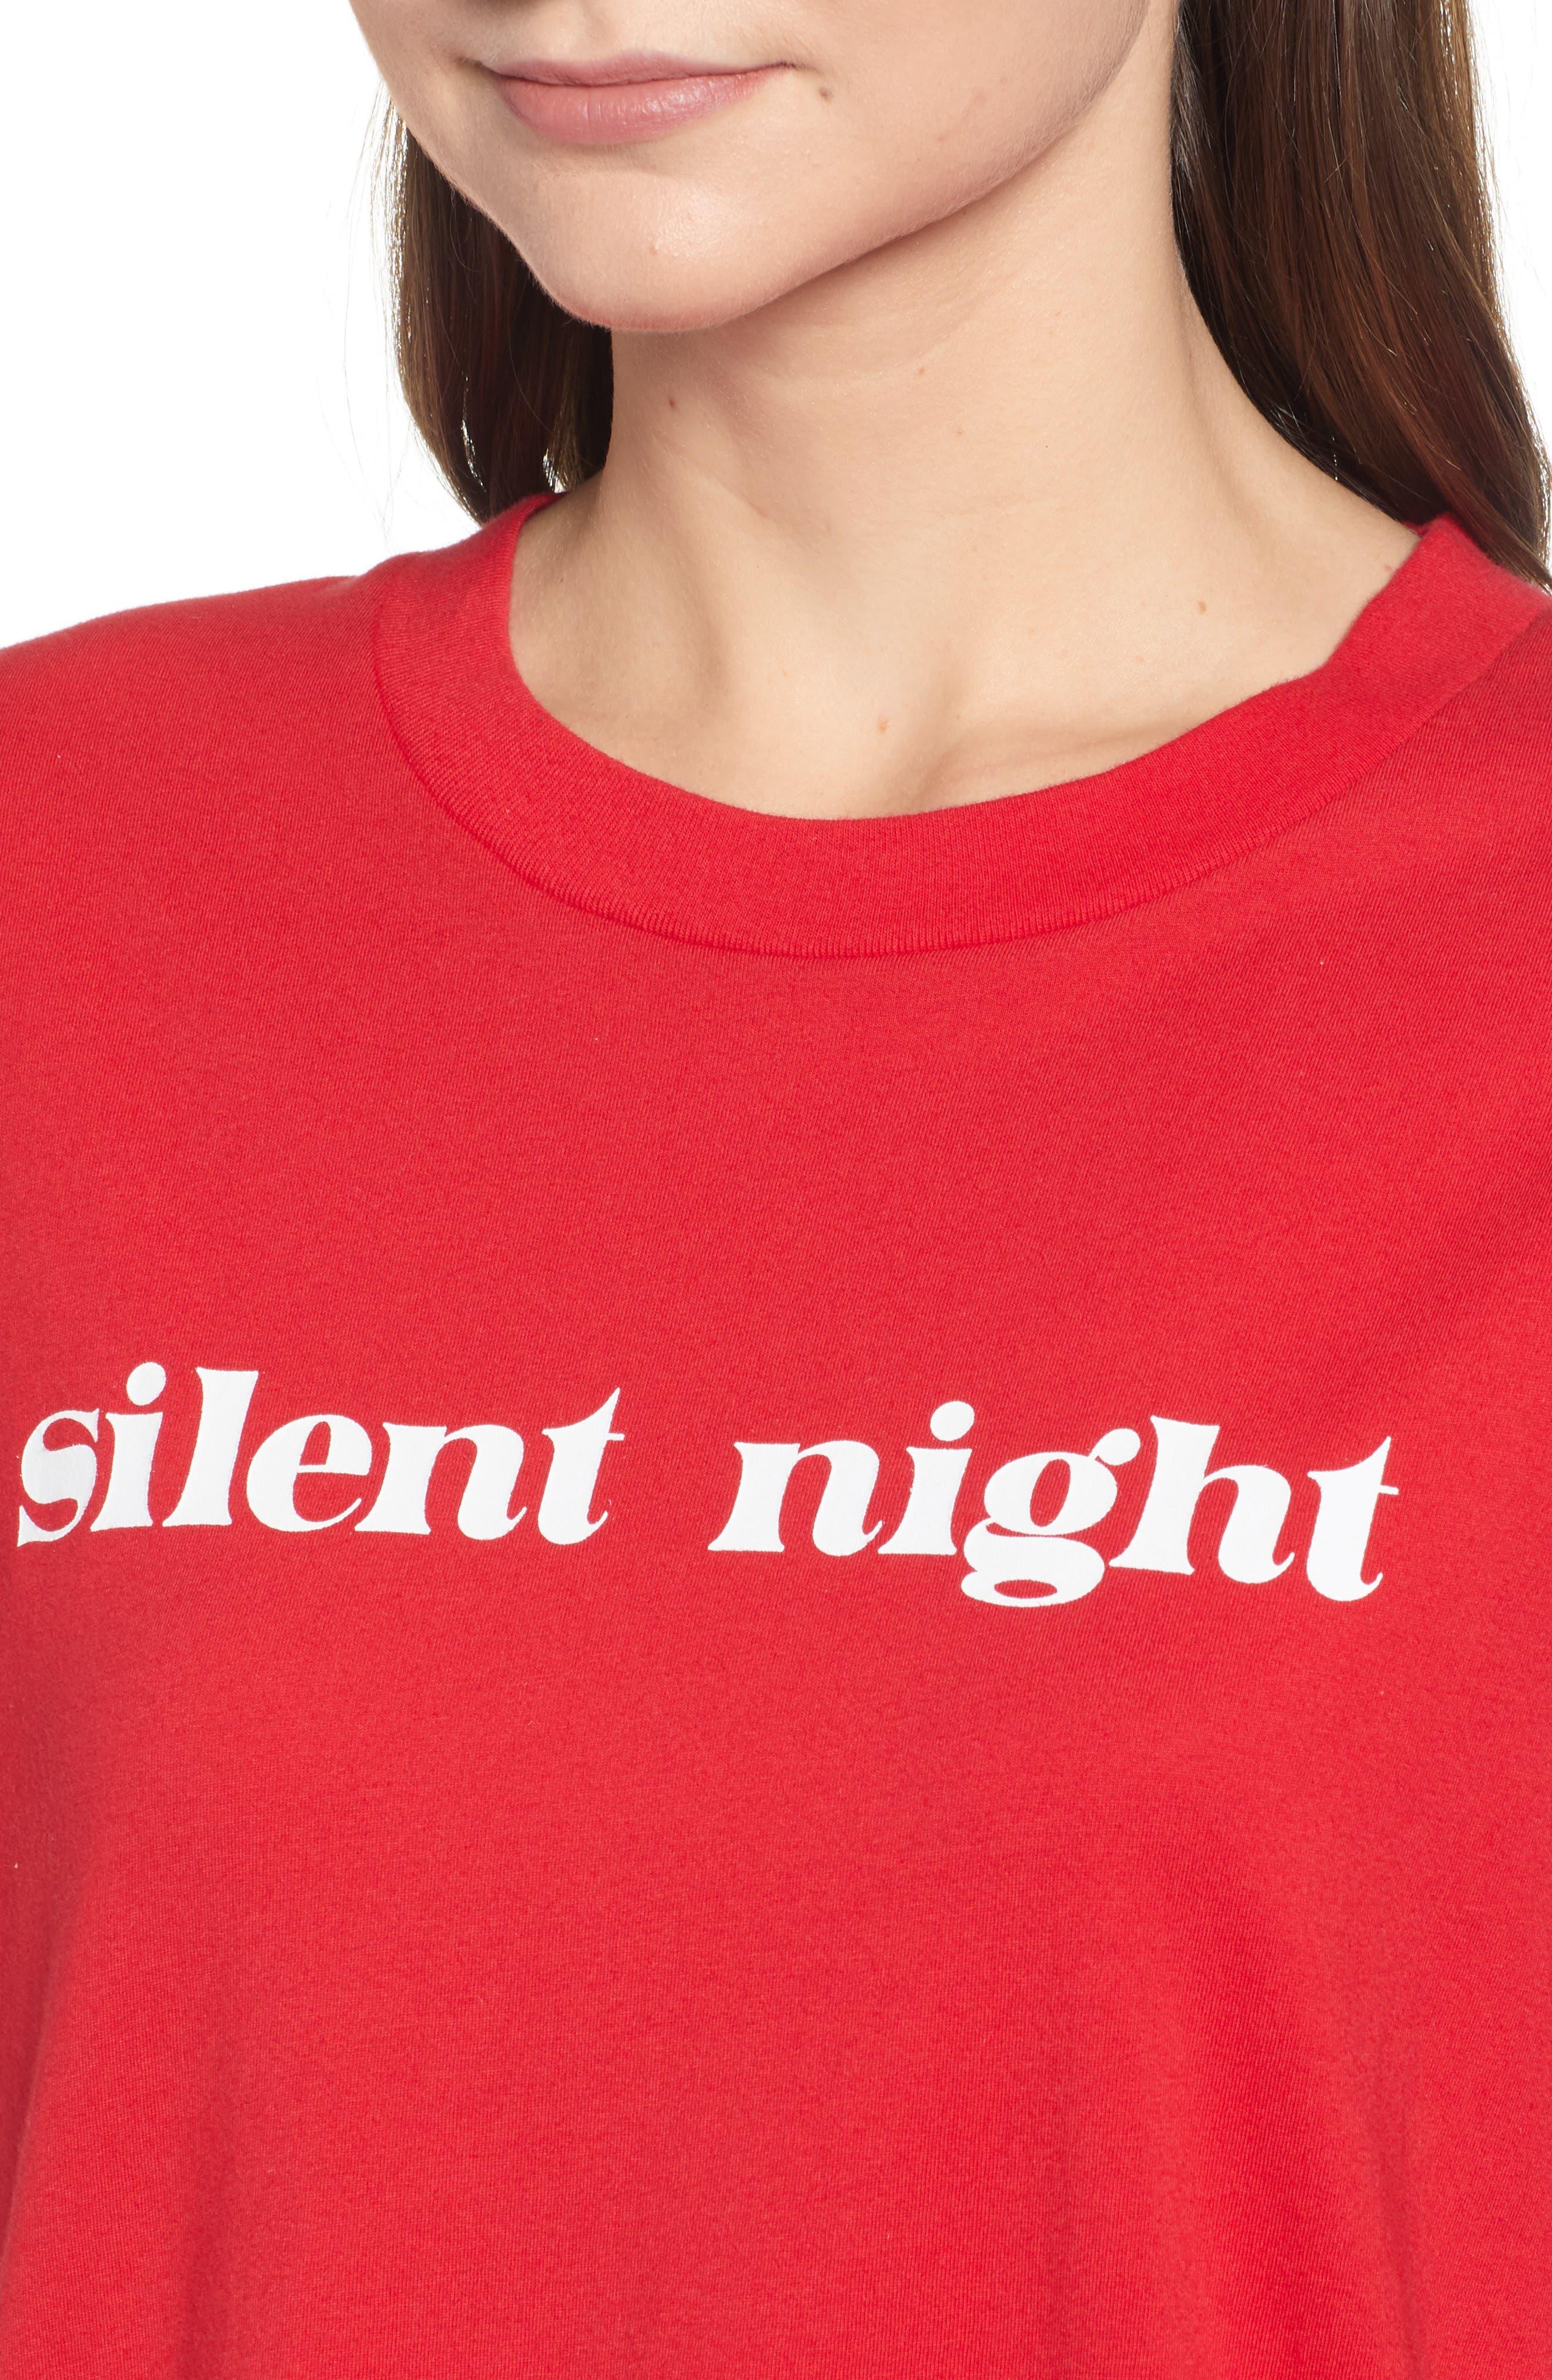 SLEEPY JONES,                             Silent Night Tee,                             Alternate thumbnail 4, color,                             RED